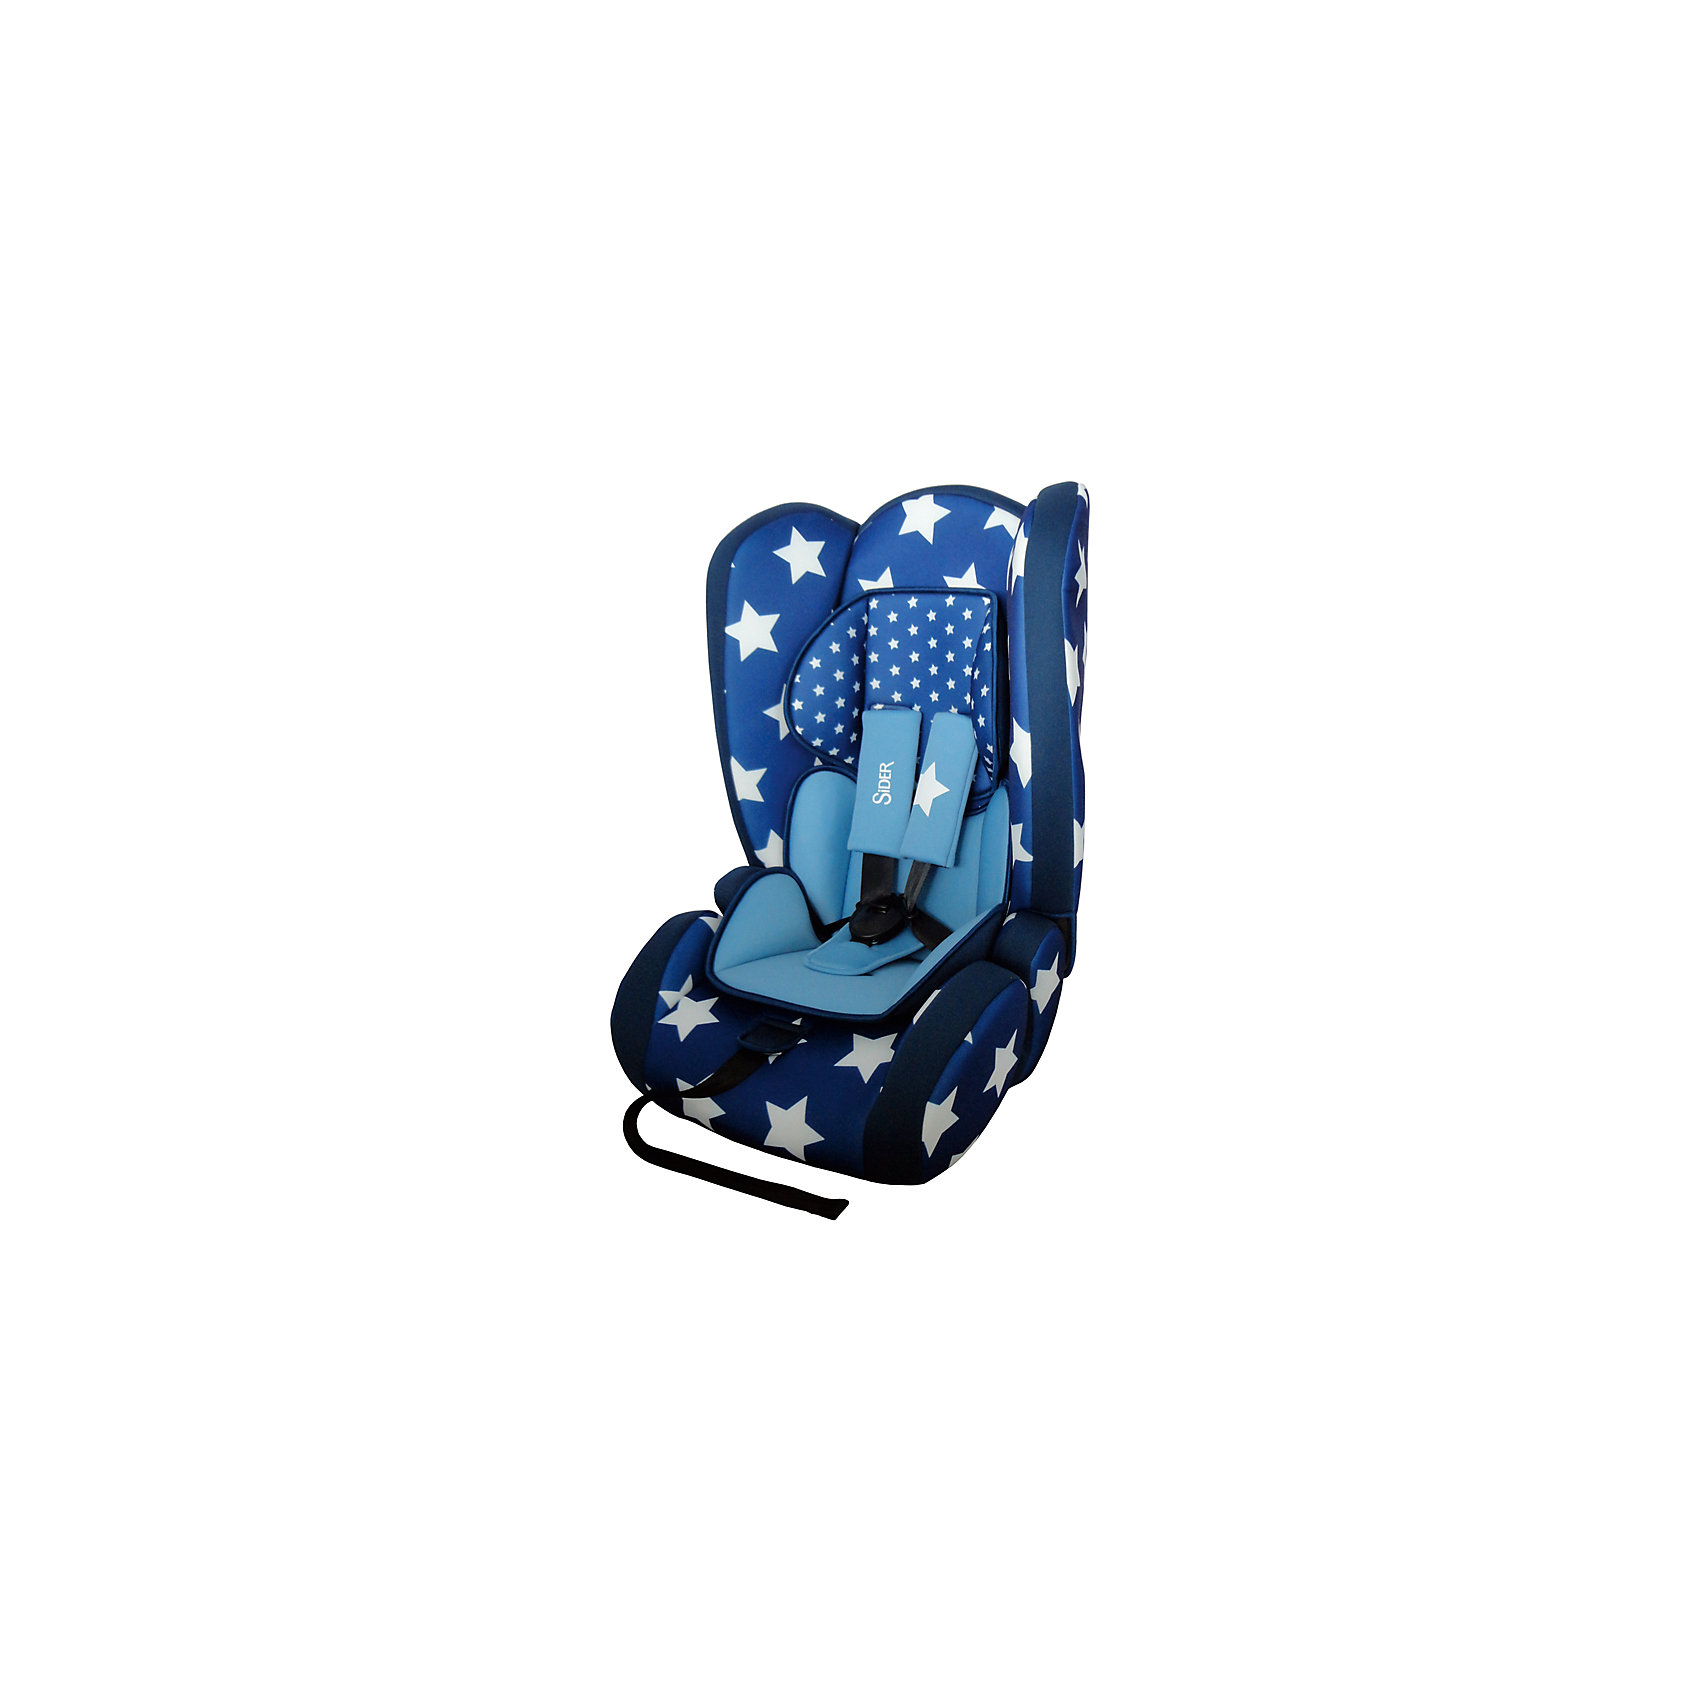 все цены на Baby Hit Автокресло Sider 9-36 кг., Babyhit, синий в белую звёздочку онлайн